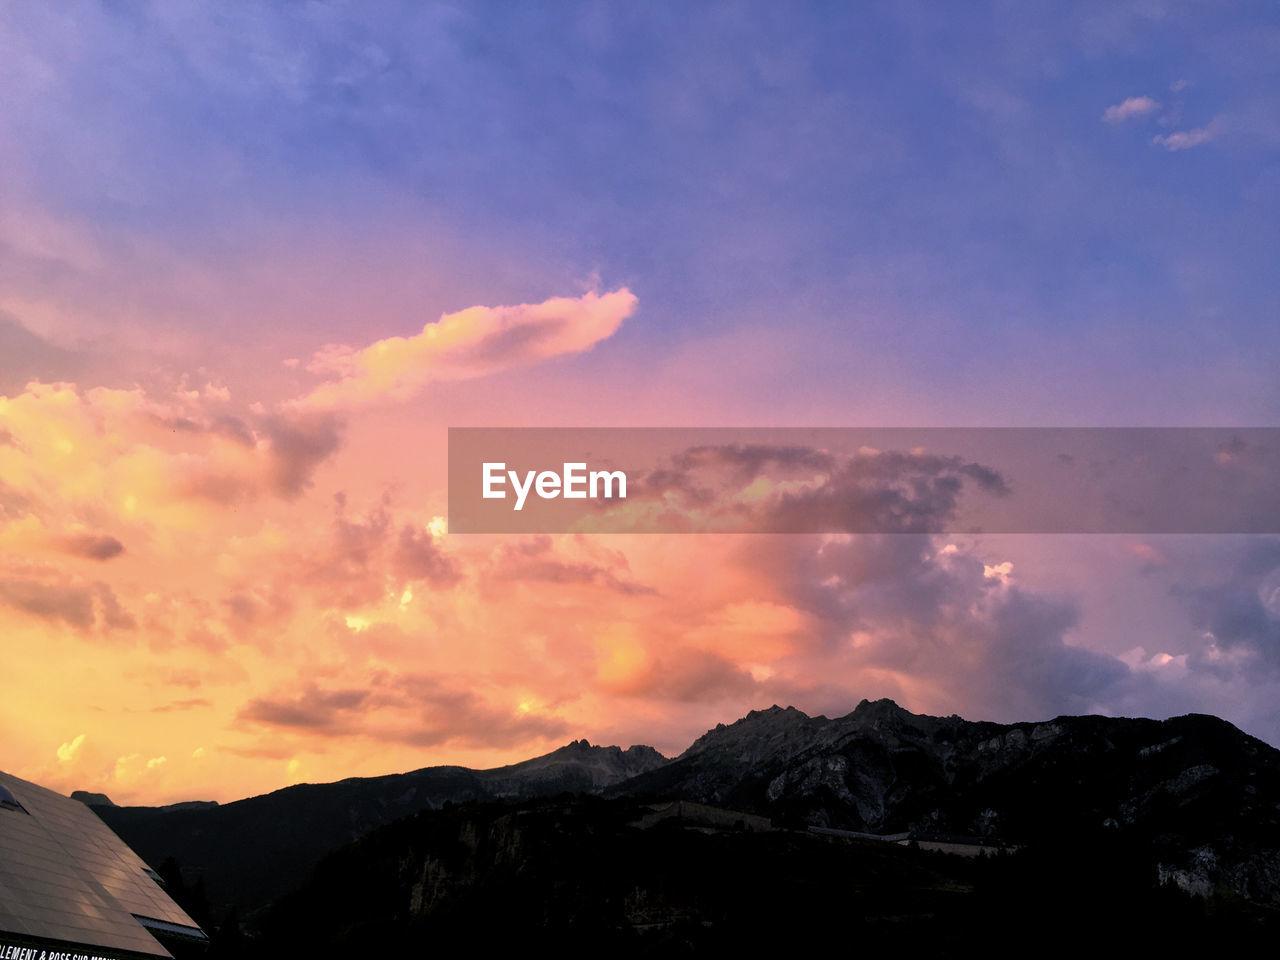 sky, mountain, sunset, cloud - sky, beauty in nature, scenics - nature, nature, environment, no people, tranquility, tranquil scene, mountain range, orange color, landscape, outdoors, idyllic, mountain peak, scenery, silhouette, non-urban scene, high, range